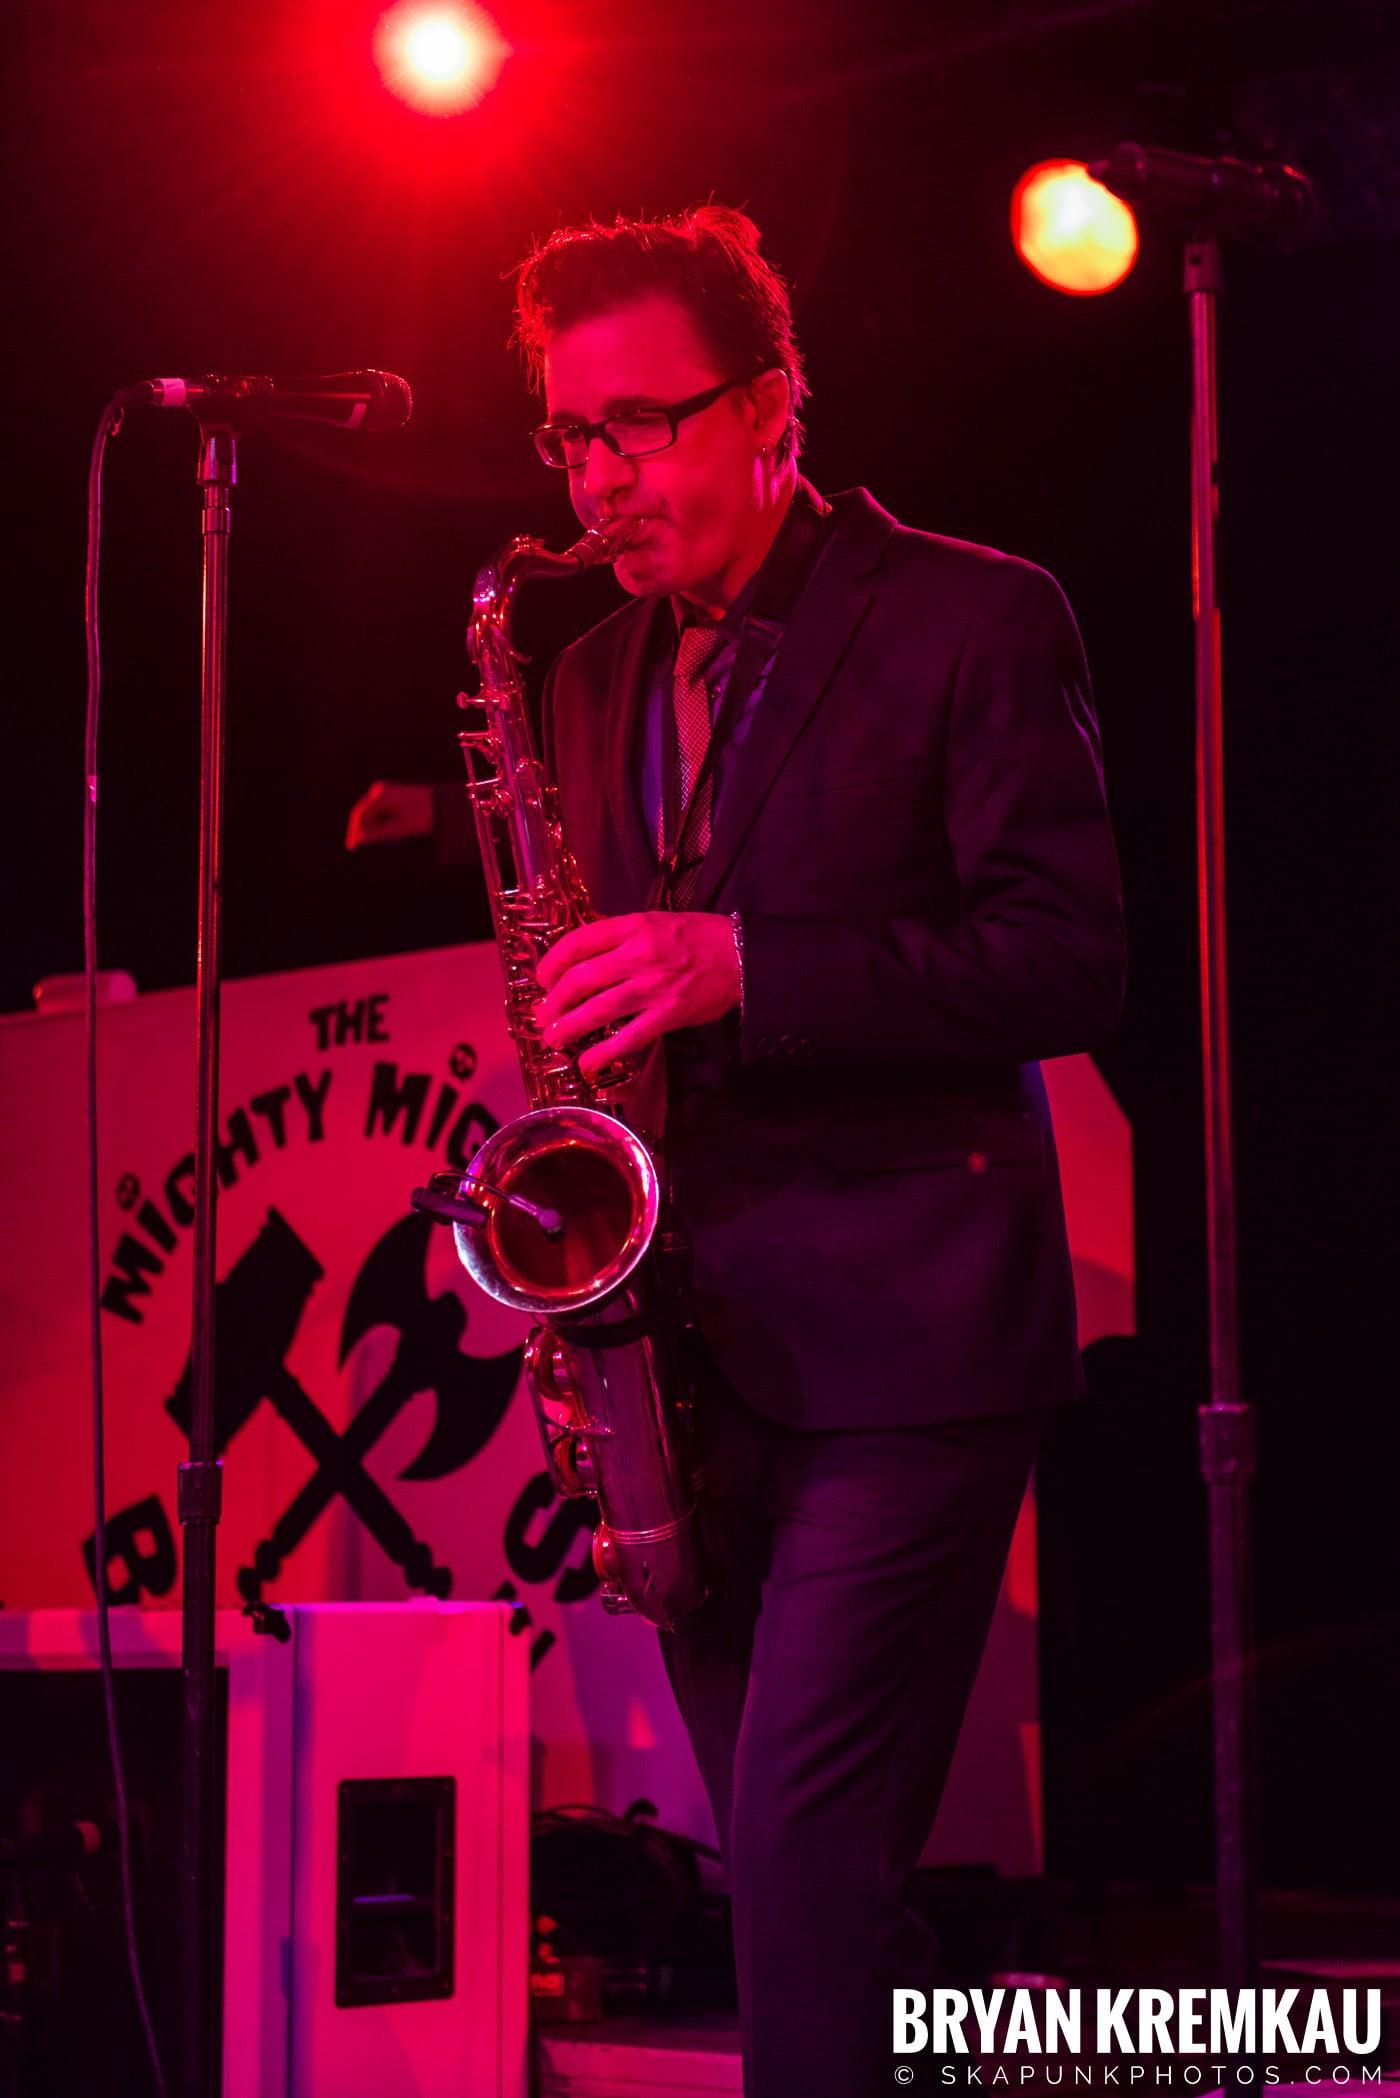 Mighty Mighty Bosstones @ Starland Ballroom, Sayreville, NJ - 7.29.17 (20)